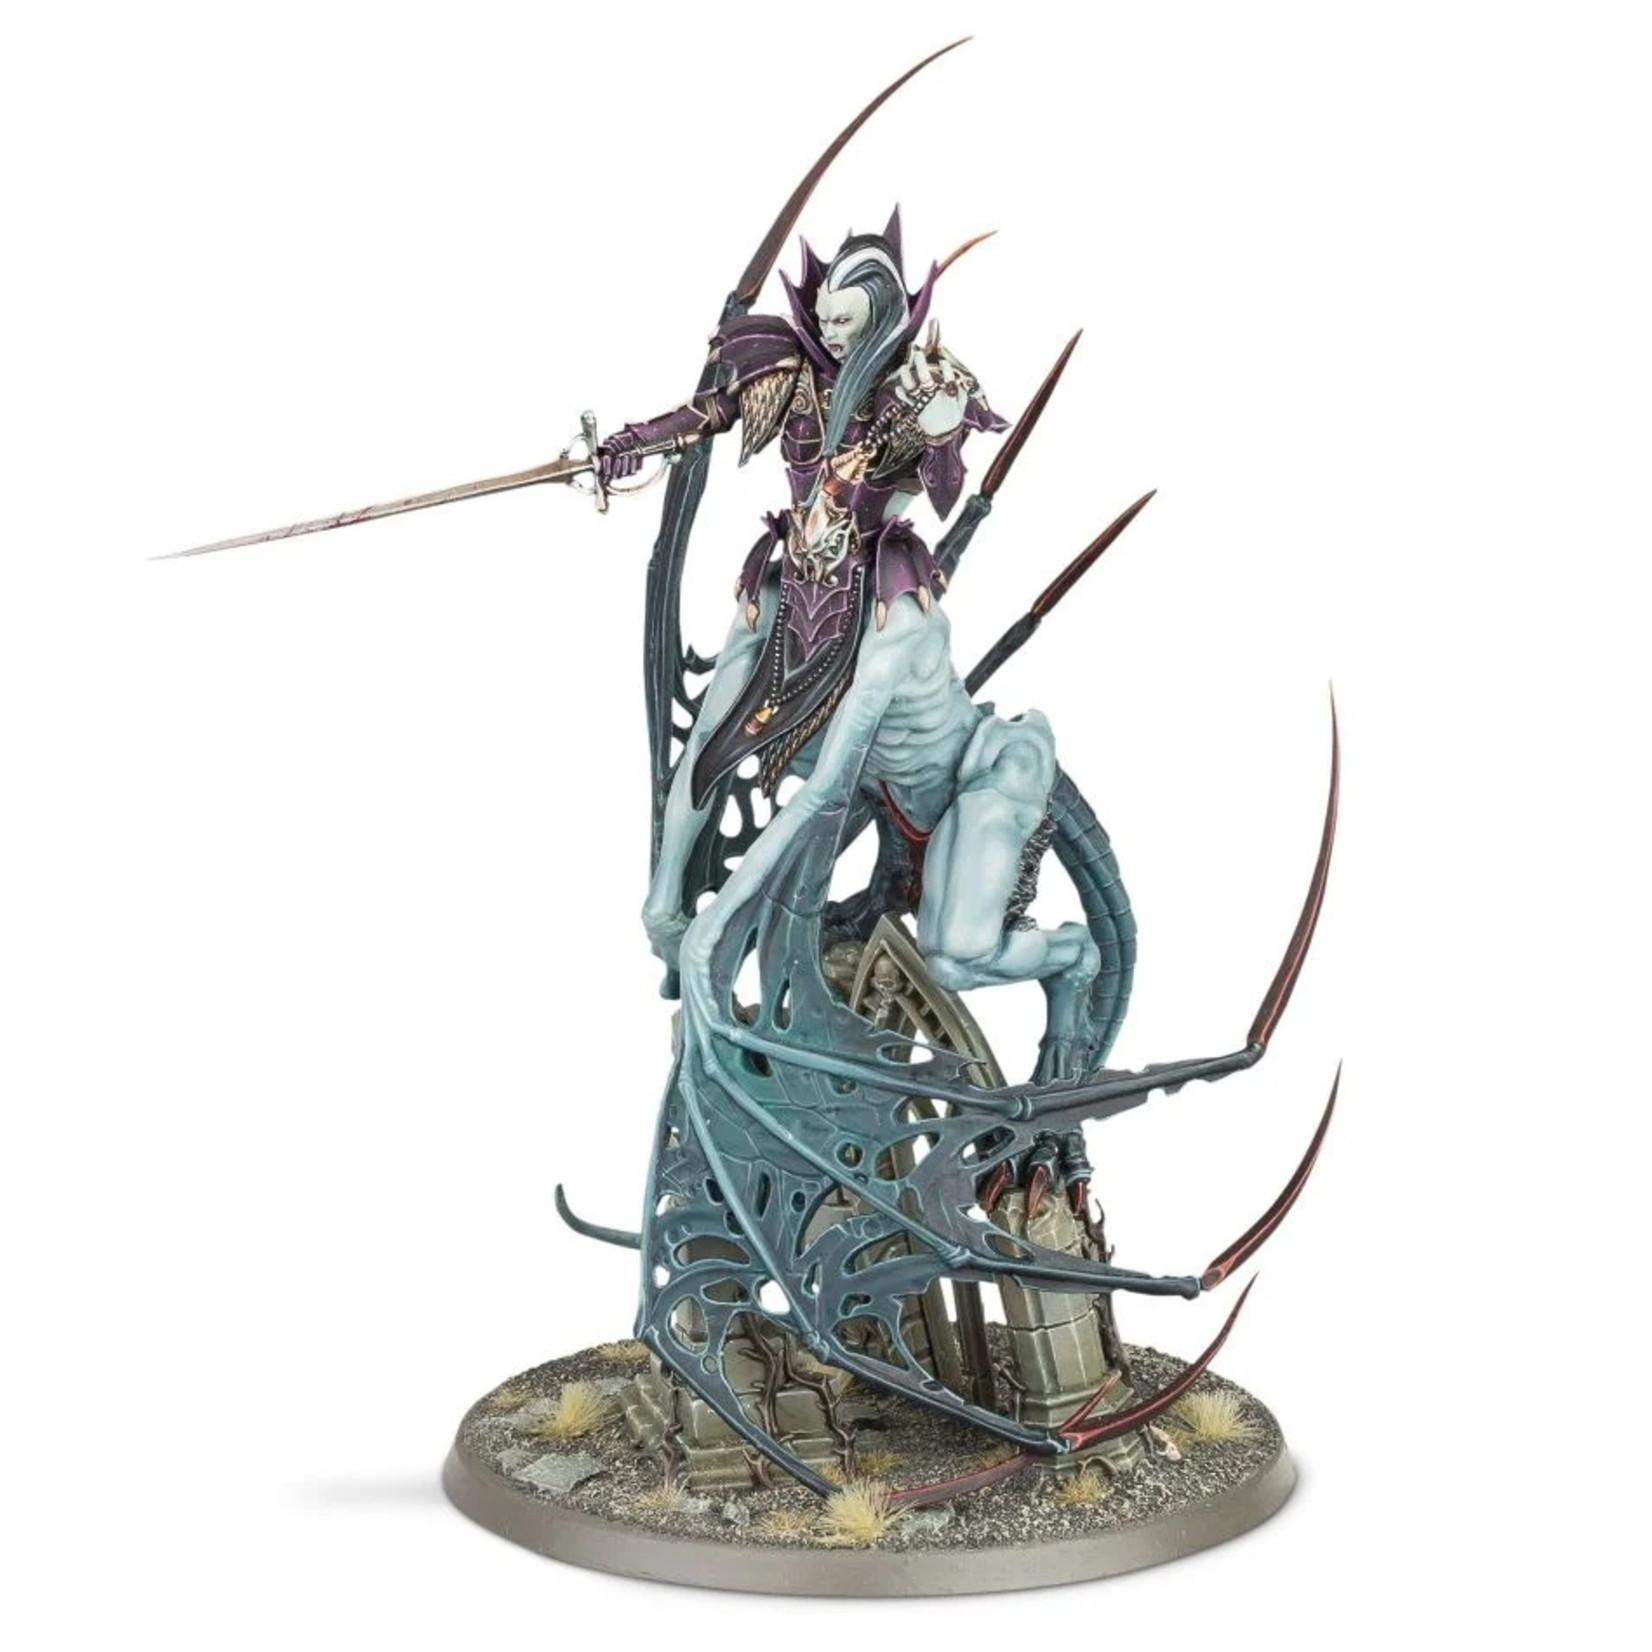 Games Workshop Lauka Vai, Mother of Nightmares